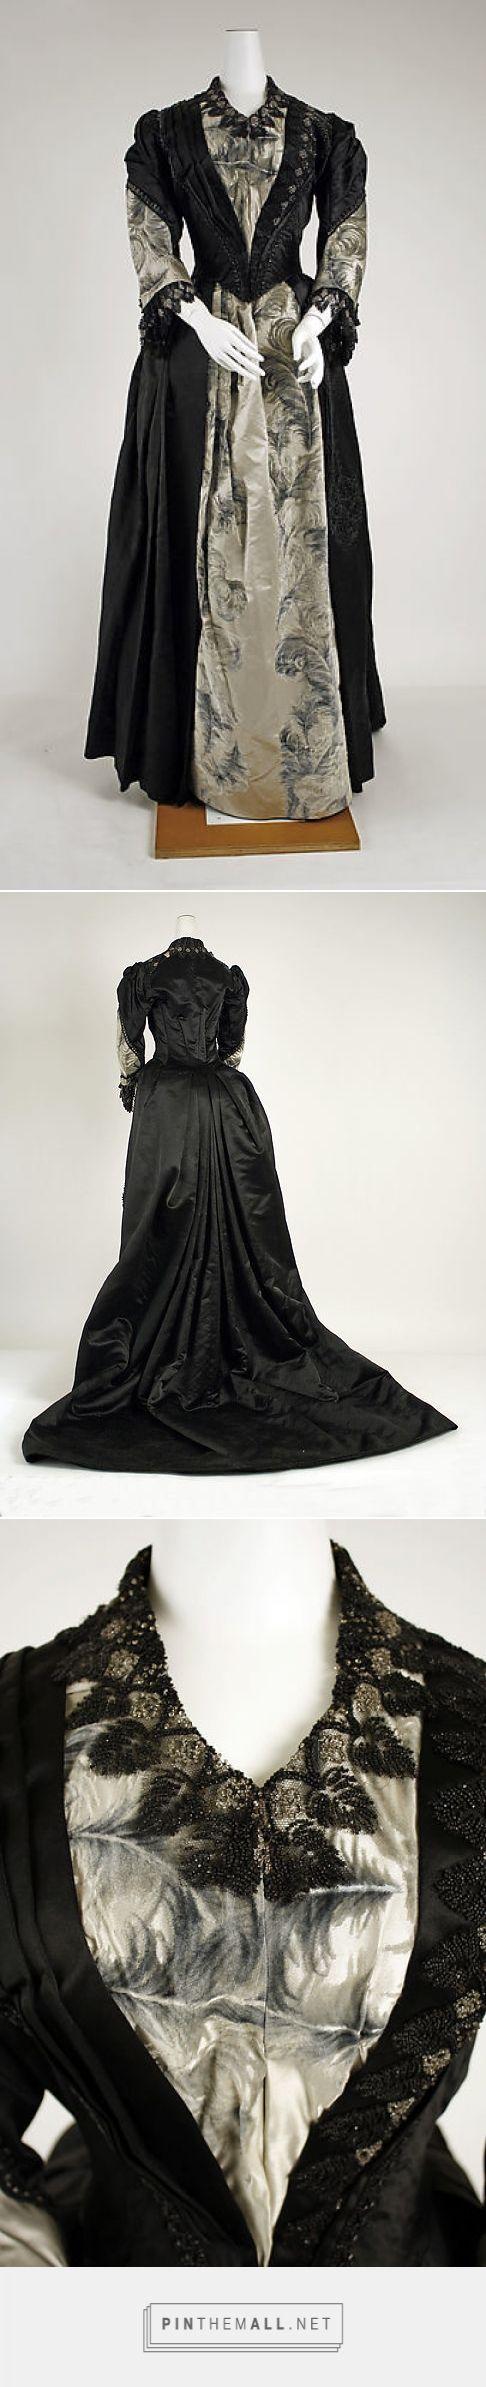 Evening dress 1885-89 American | The Metropolitan Museum of Art